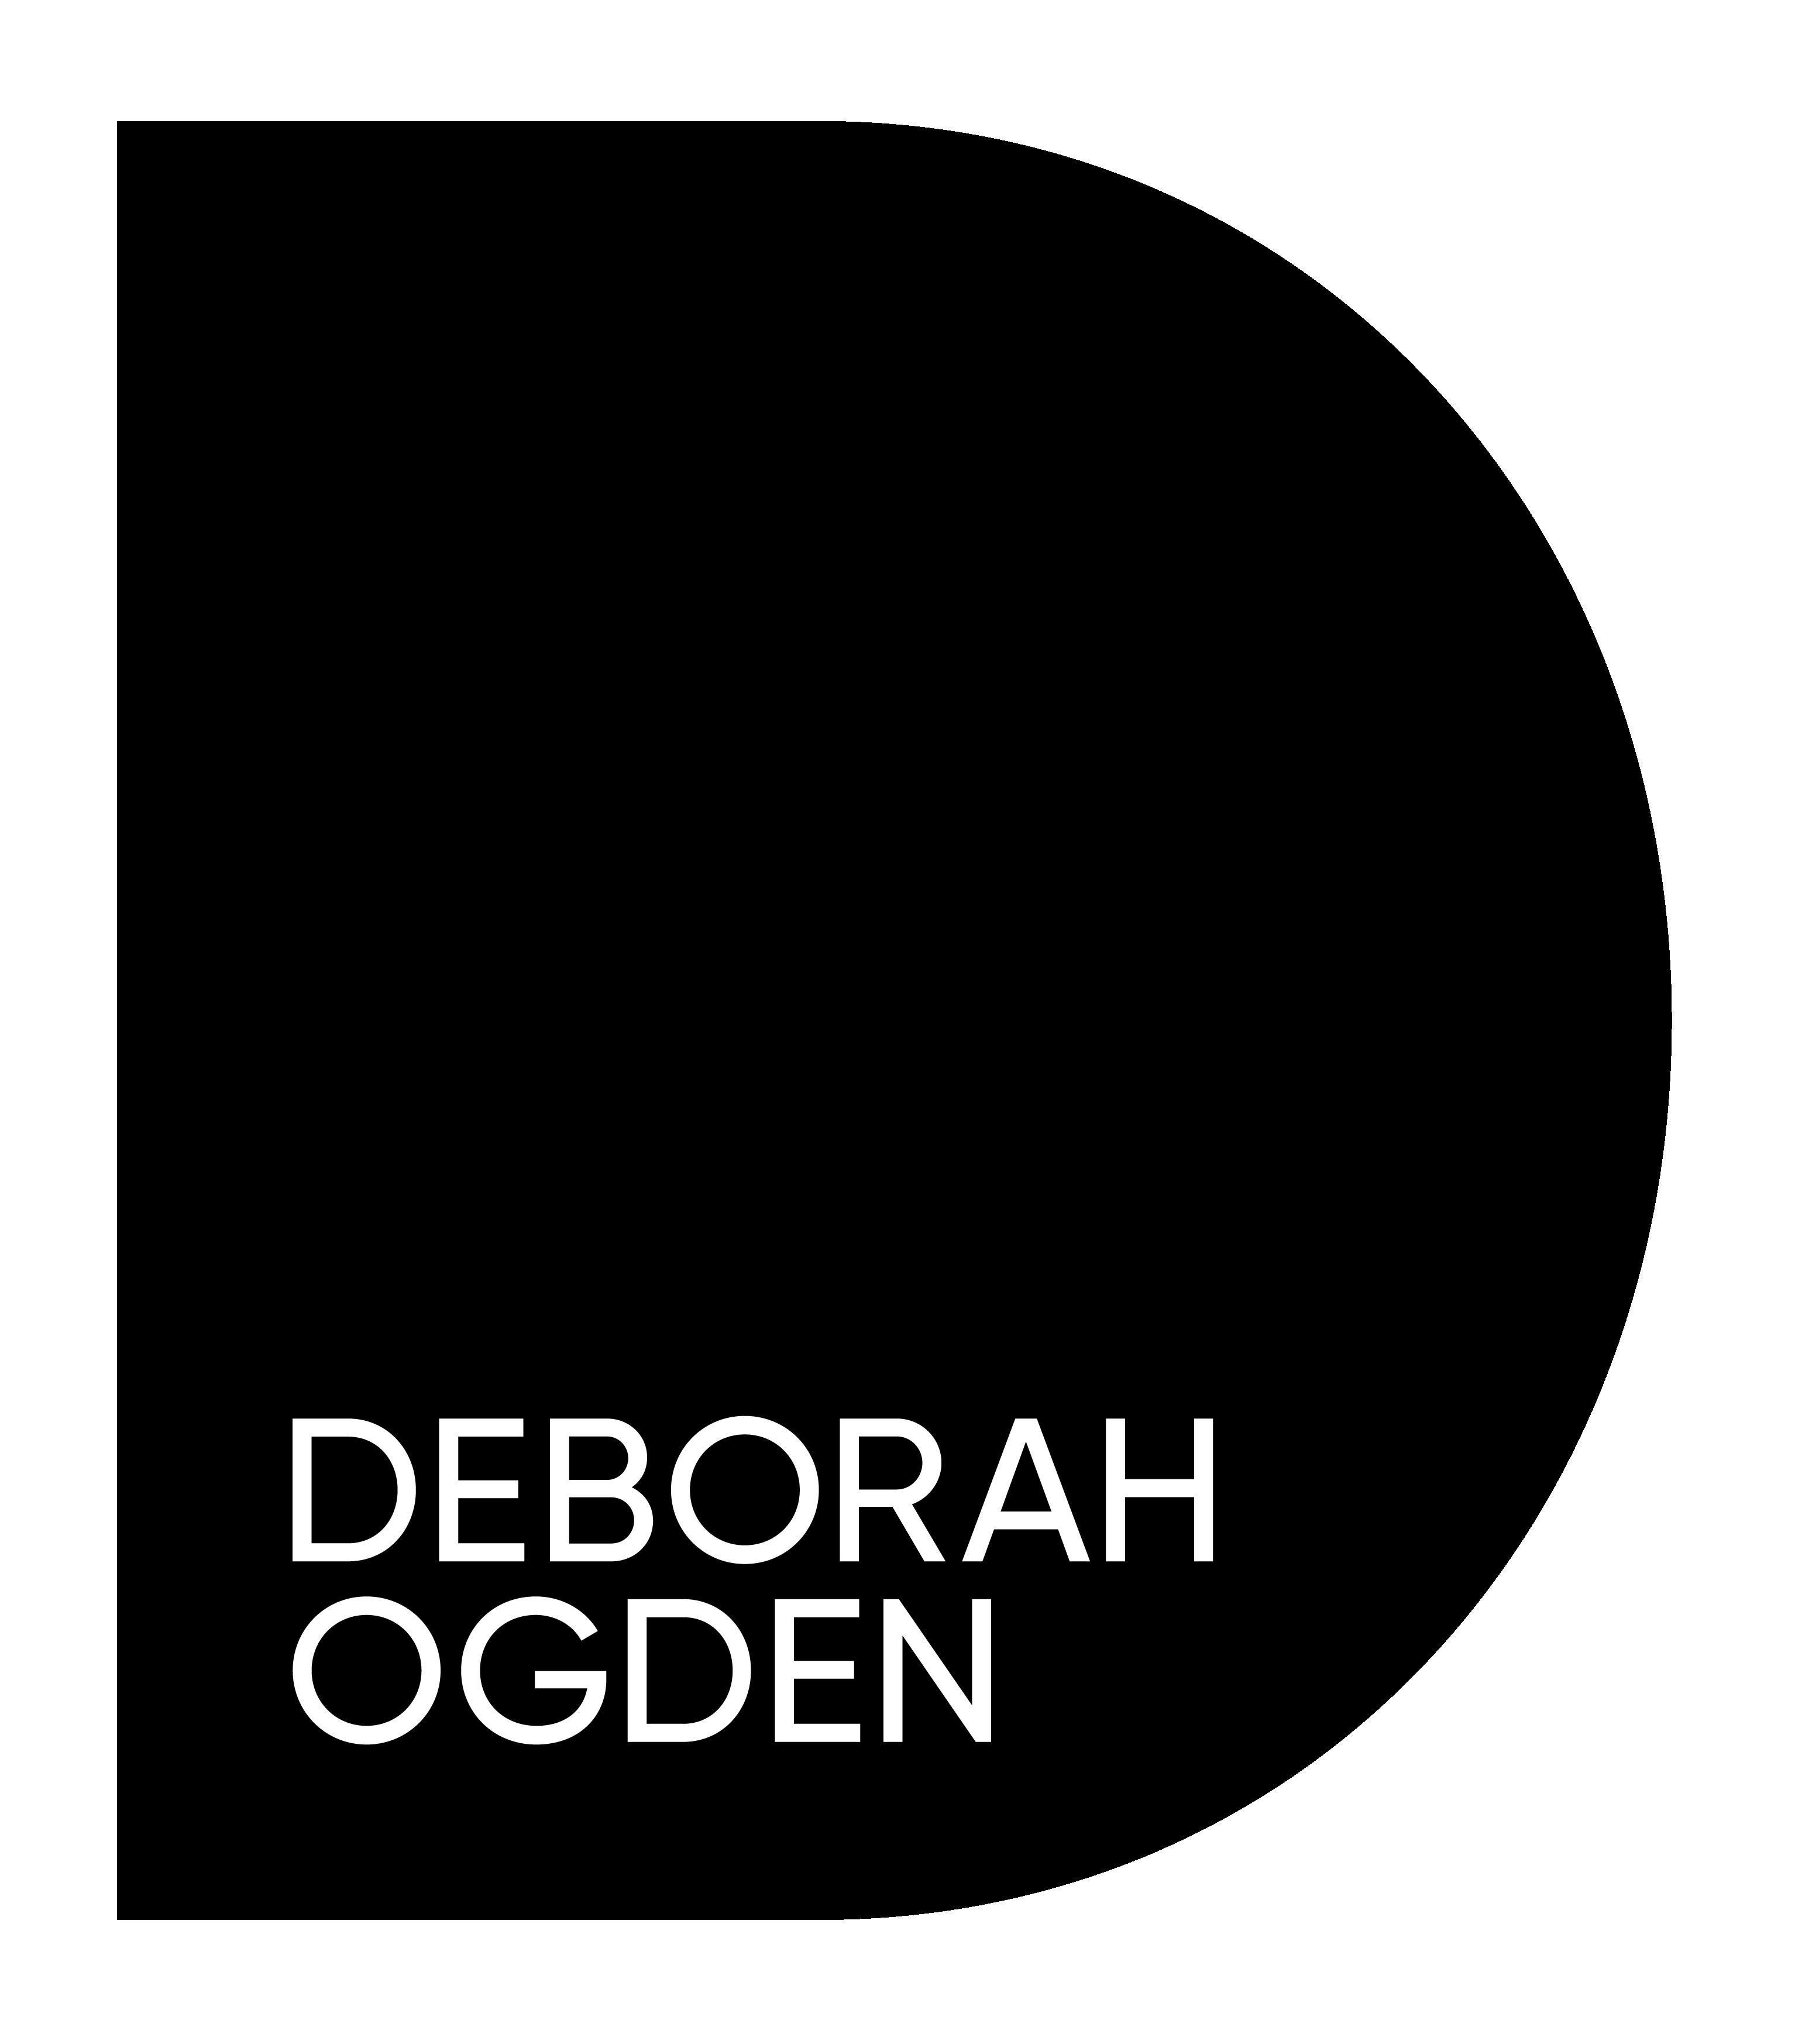 Deborah Ogden